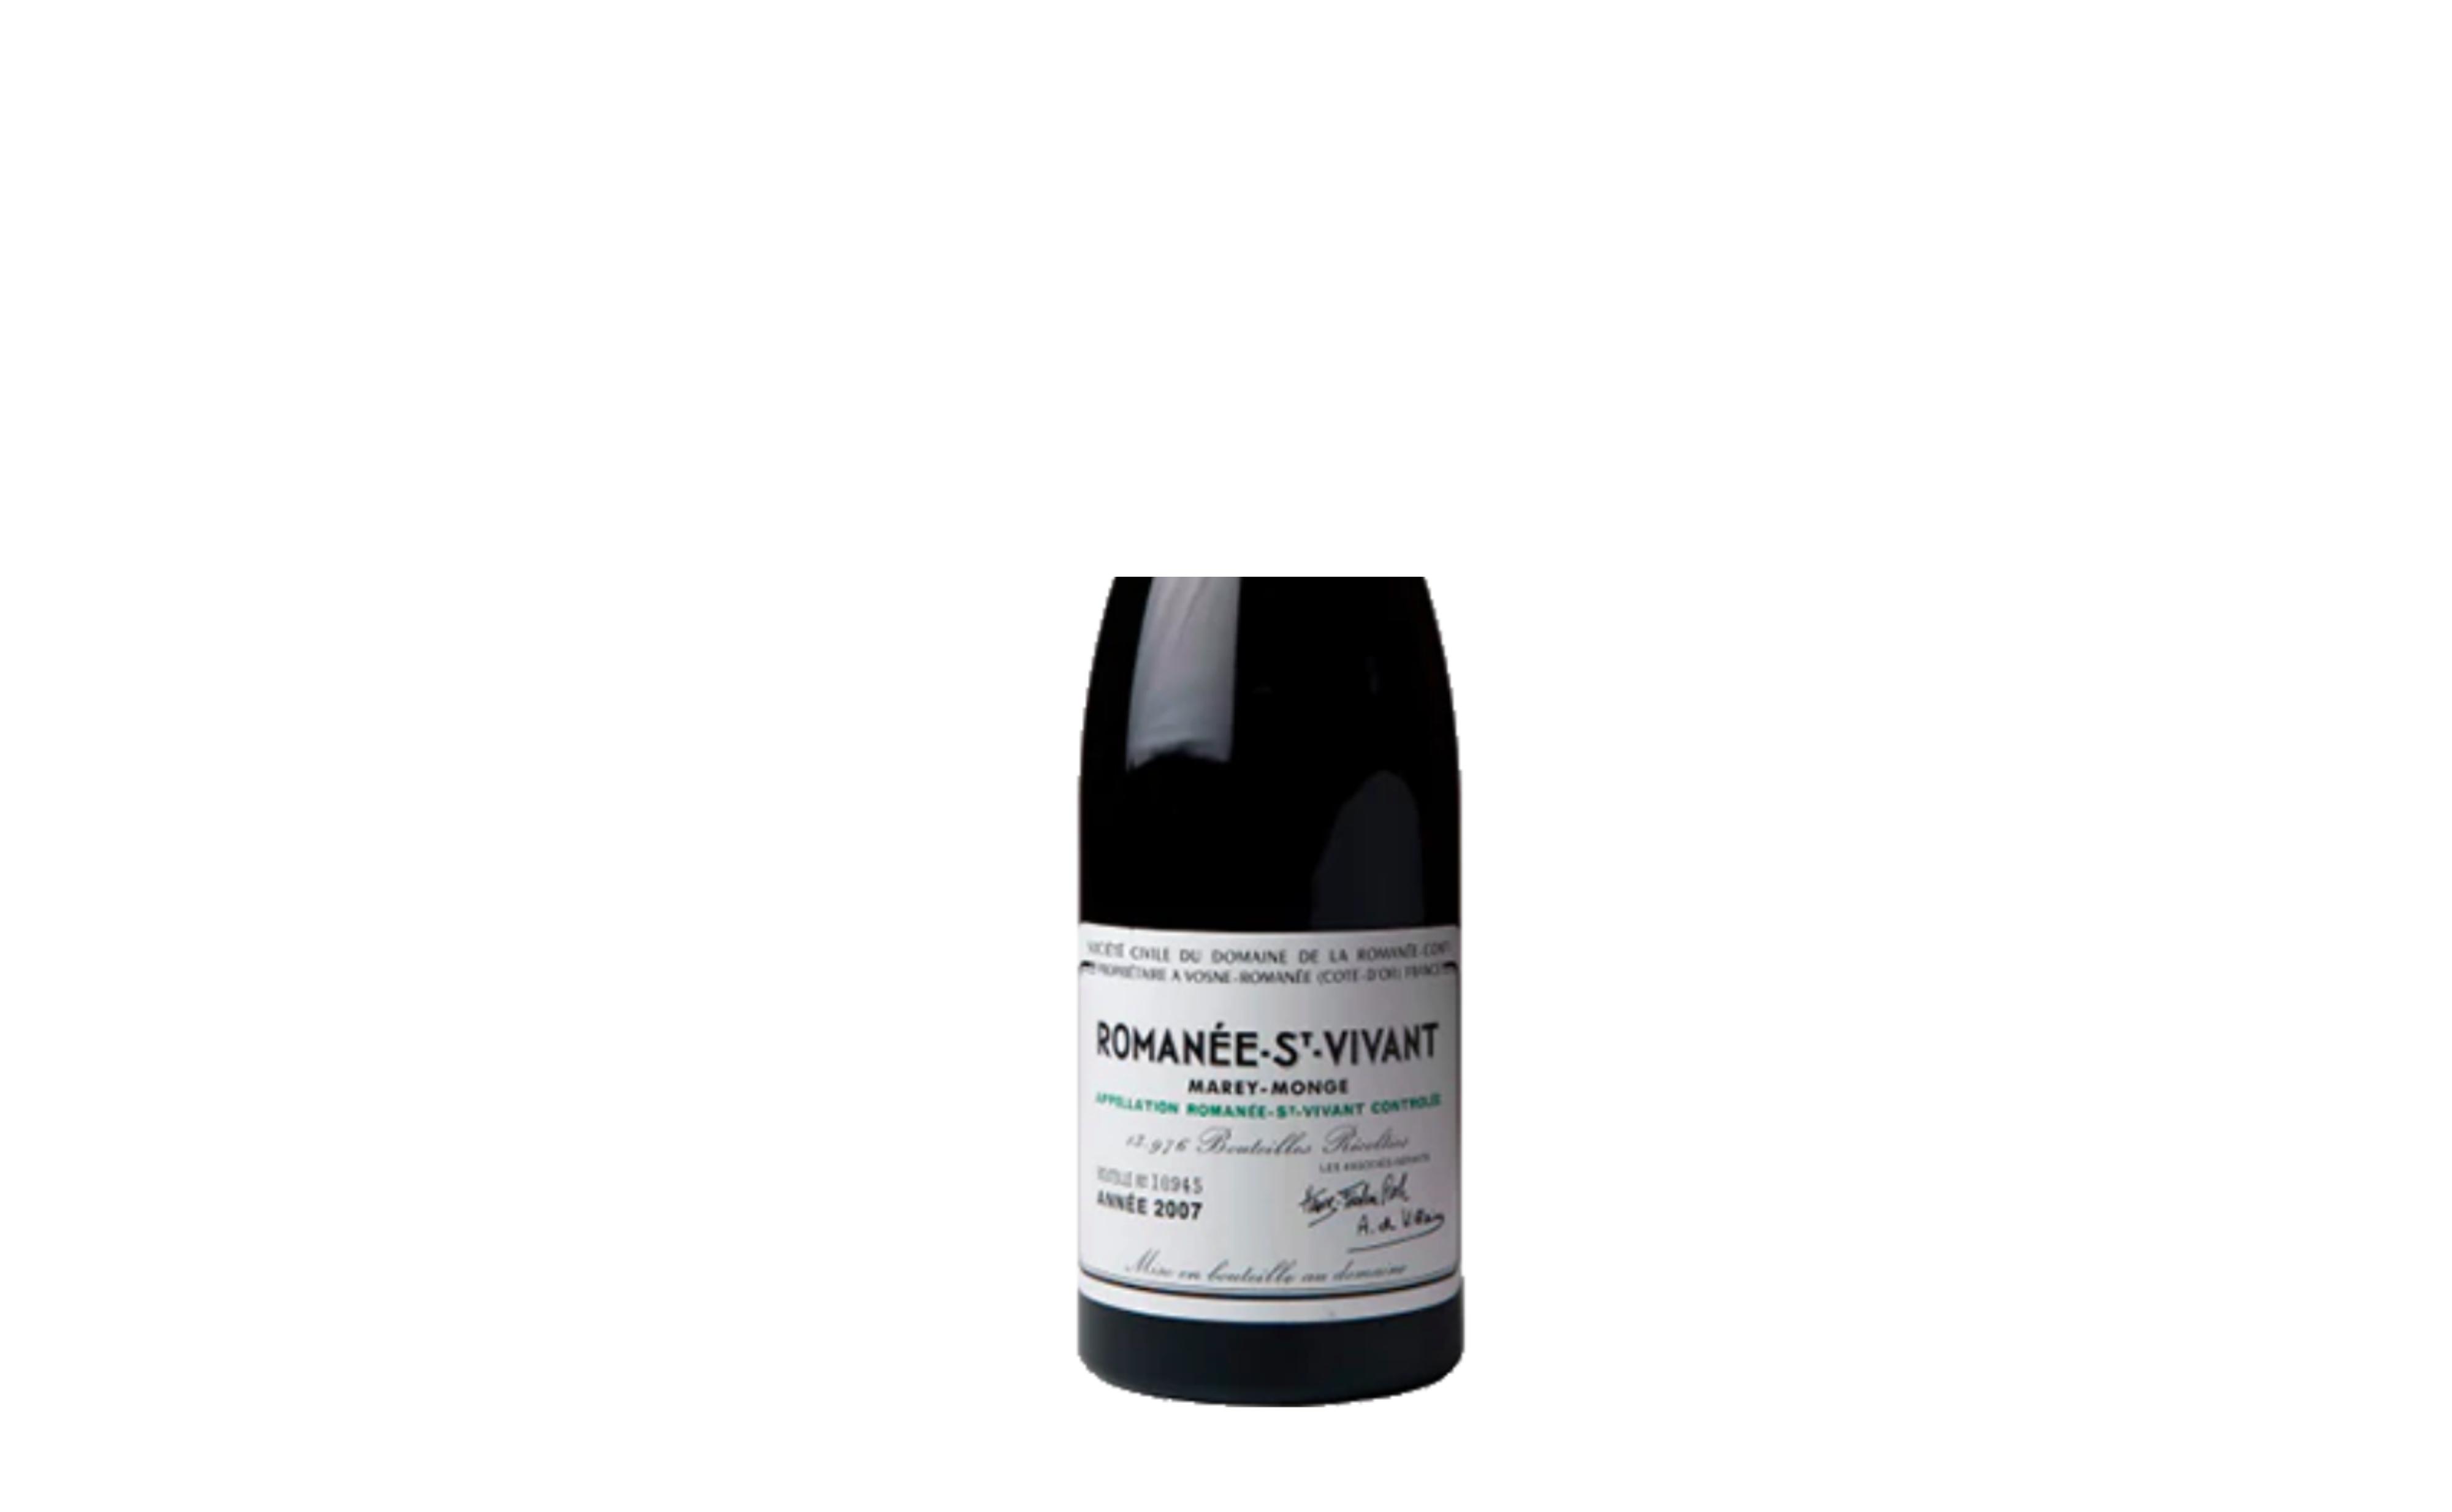 dyr-vin-vinmonopolet-polet